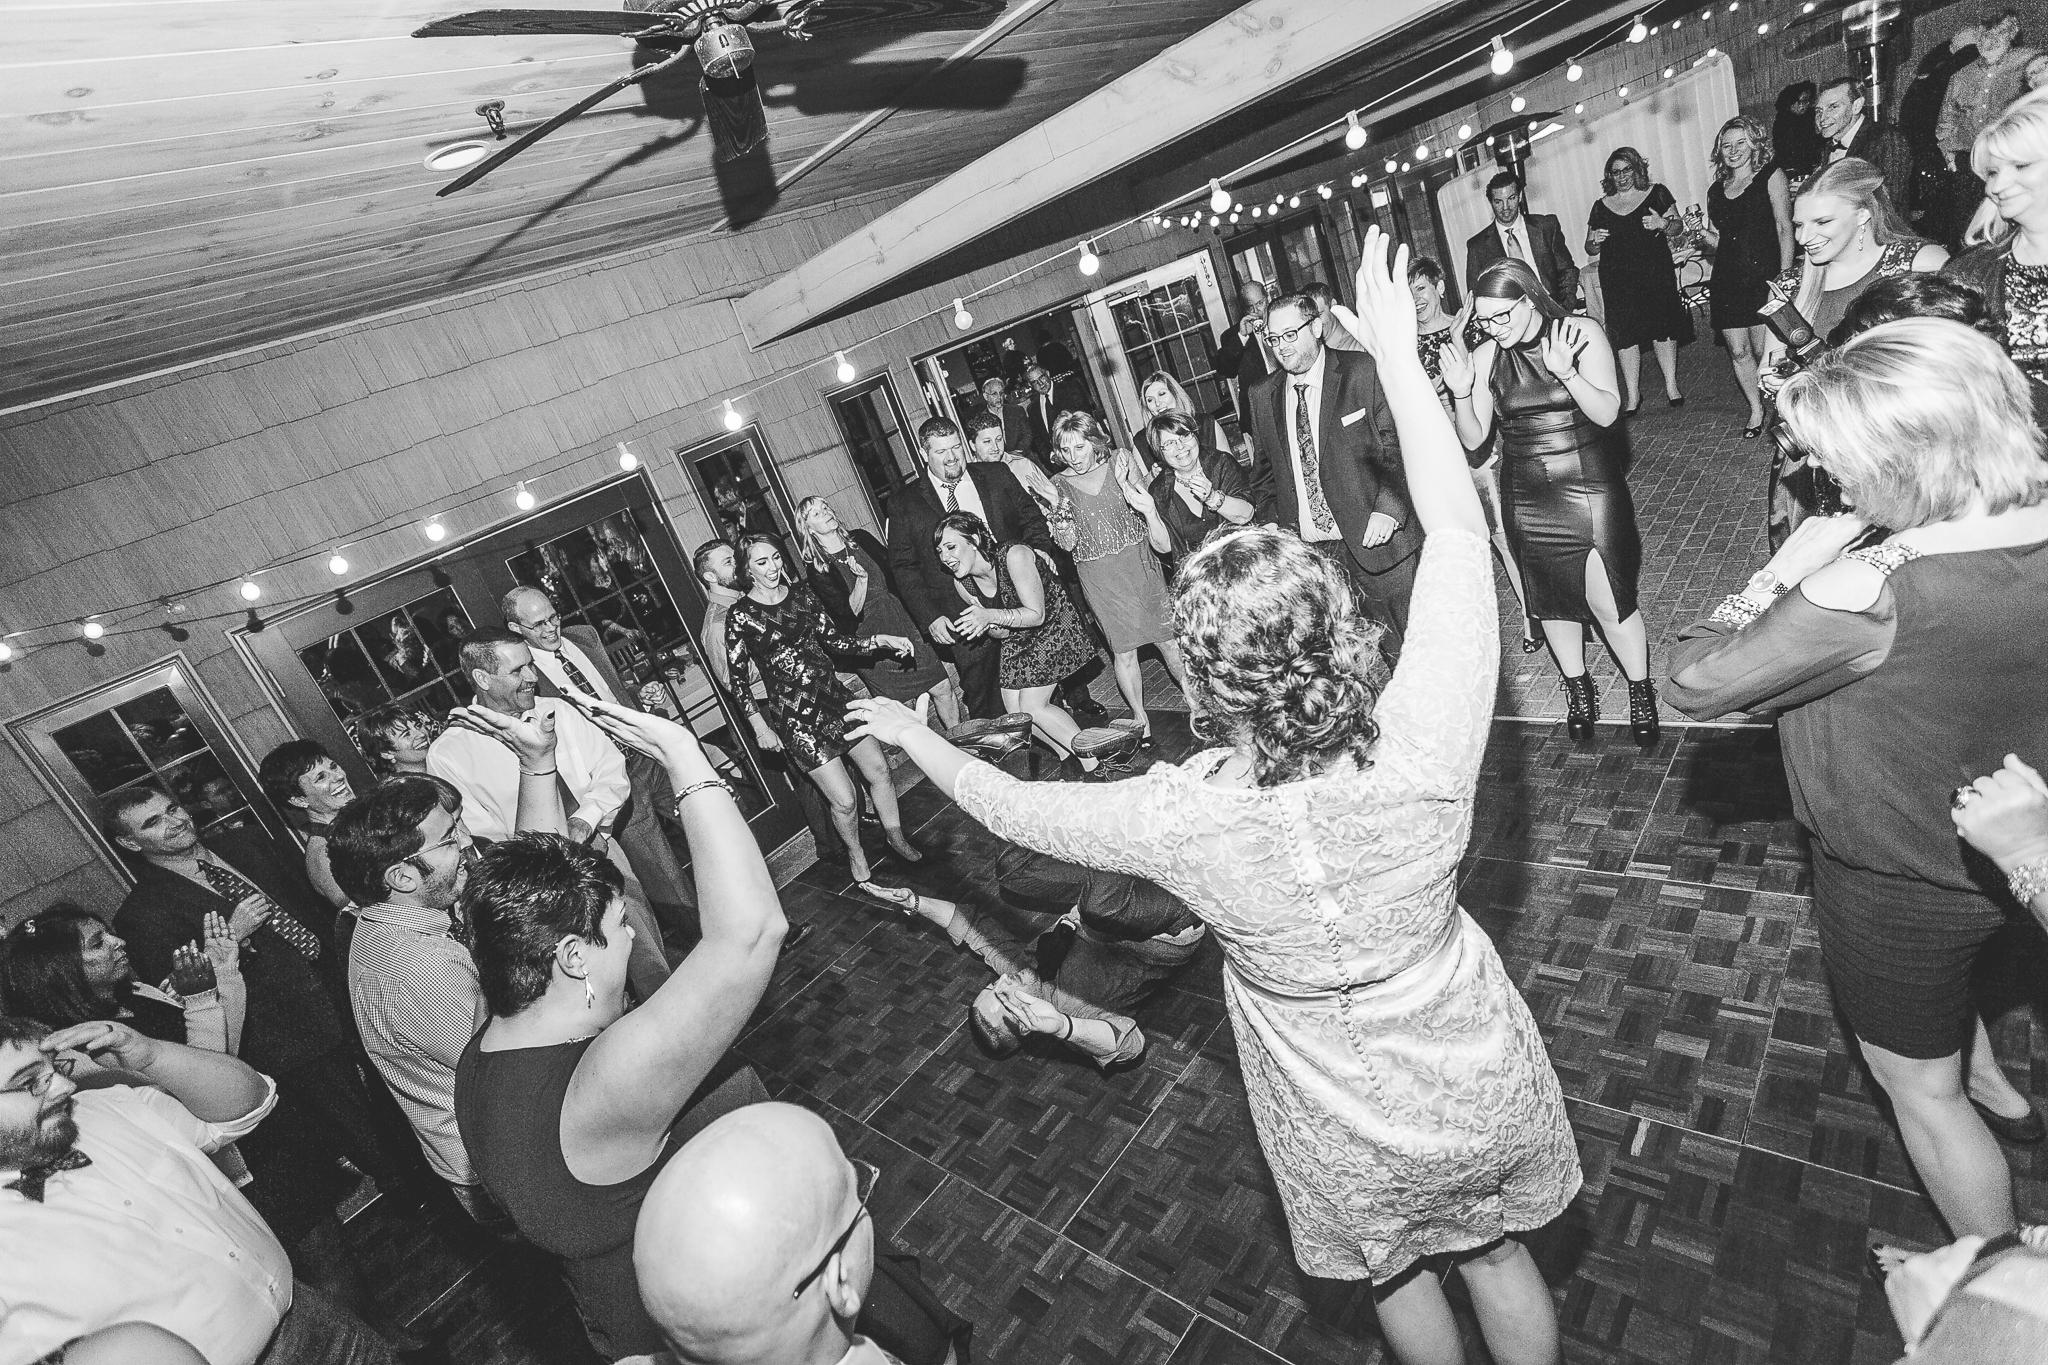 camuglia-whomstudio-chelsea_and_andy-nycphotographer-wedding-brooklyn-buffalo-timberlodge-163-5717.jpg